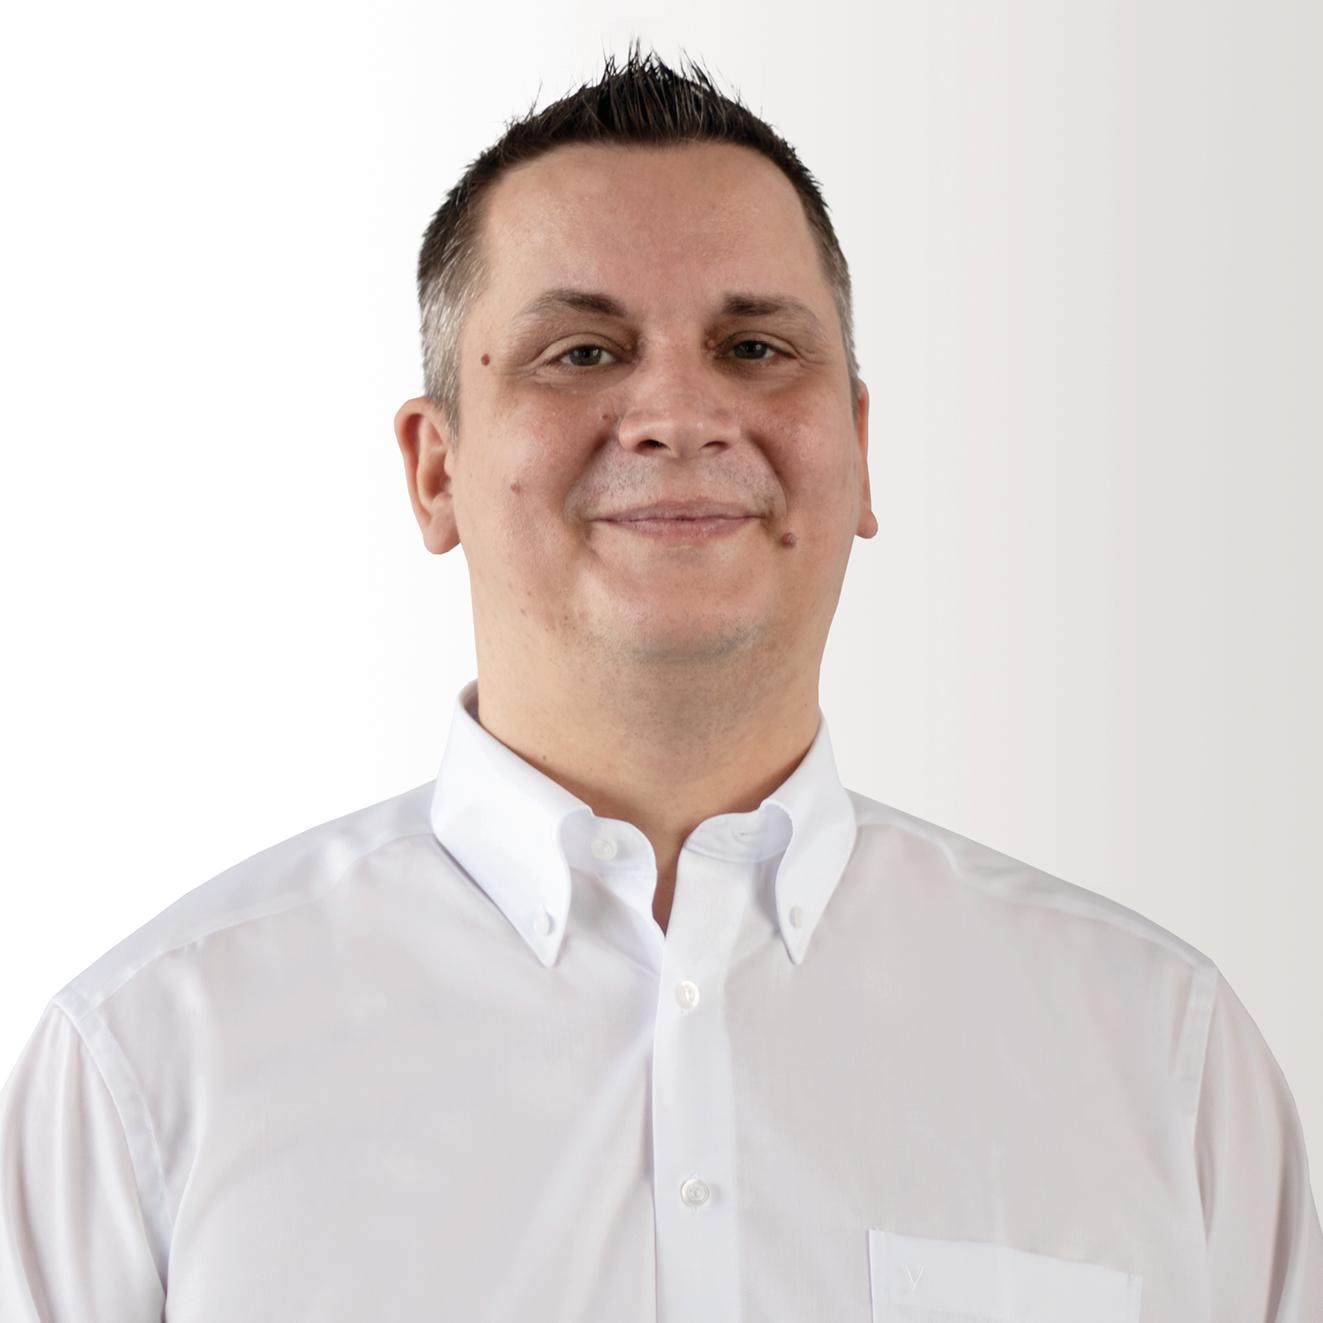 Mark Turek